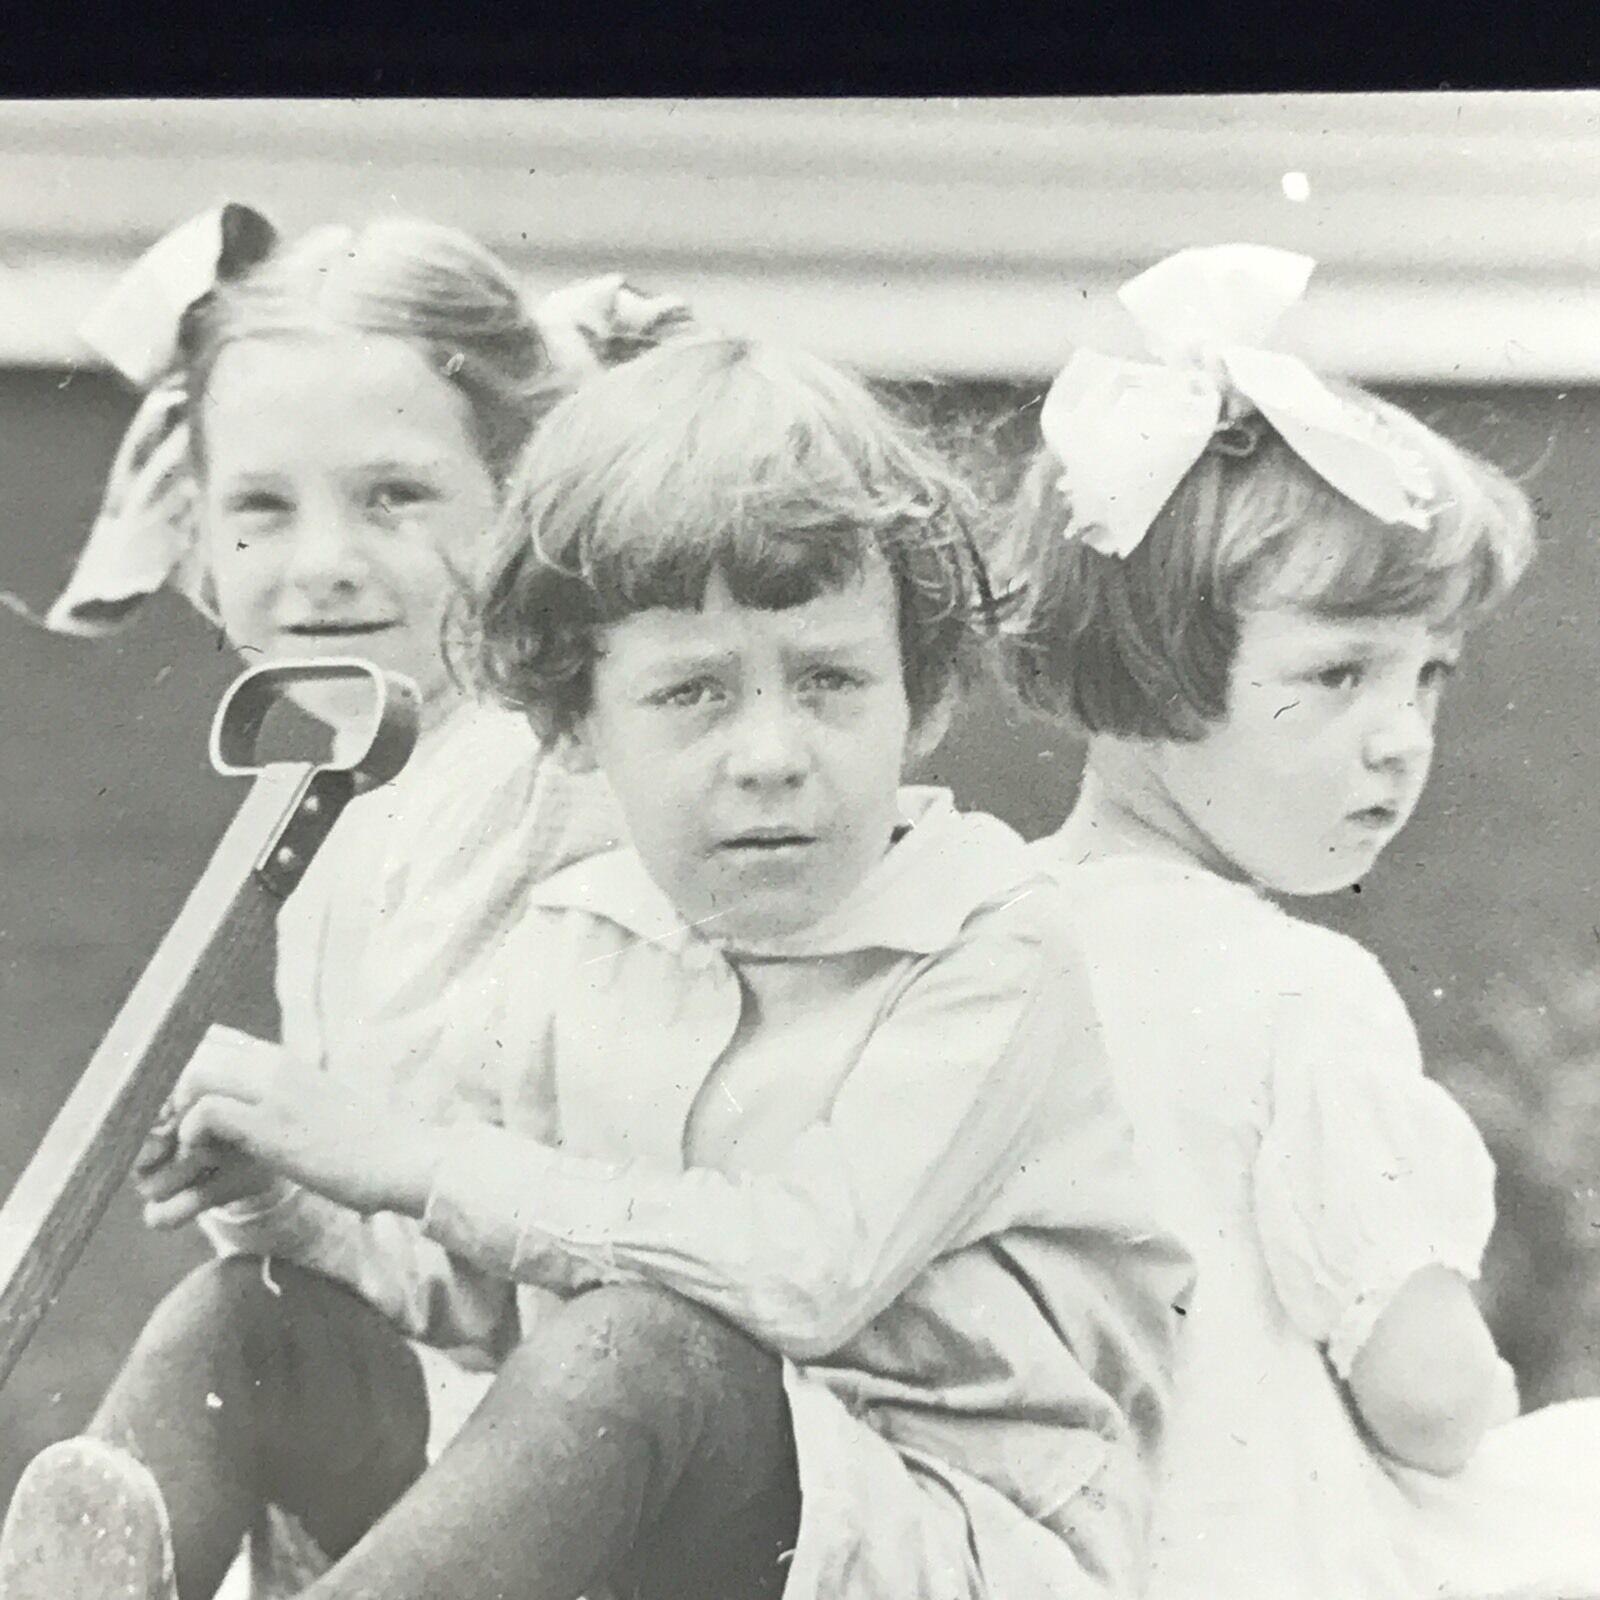 Girls in Auto-Wheel Coaster, magic lantern slide (c.1920) 4.jpg